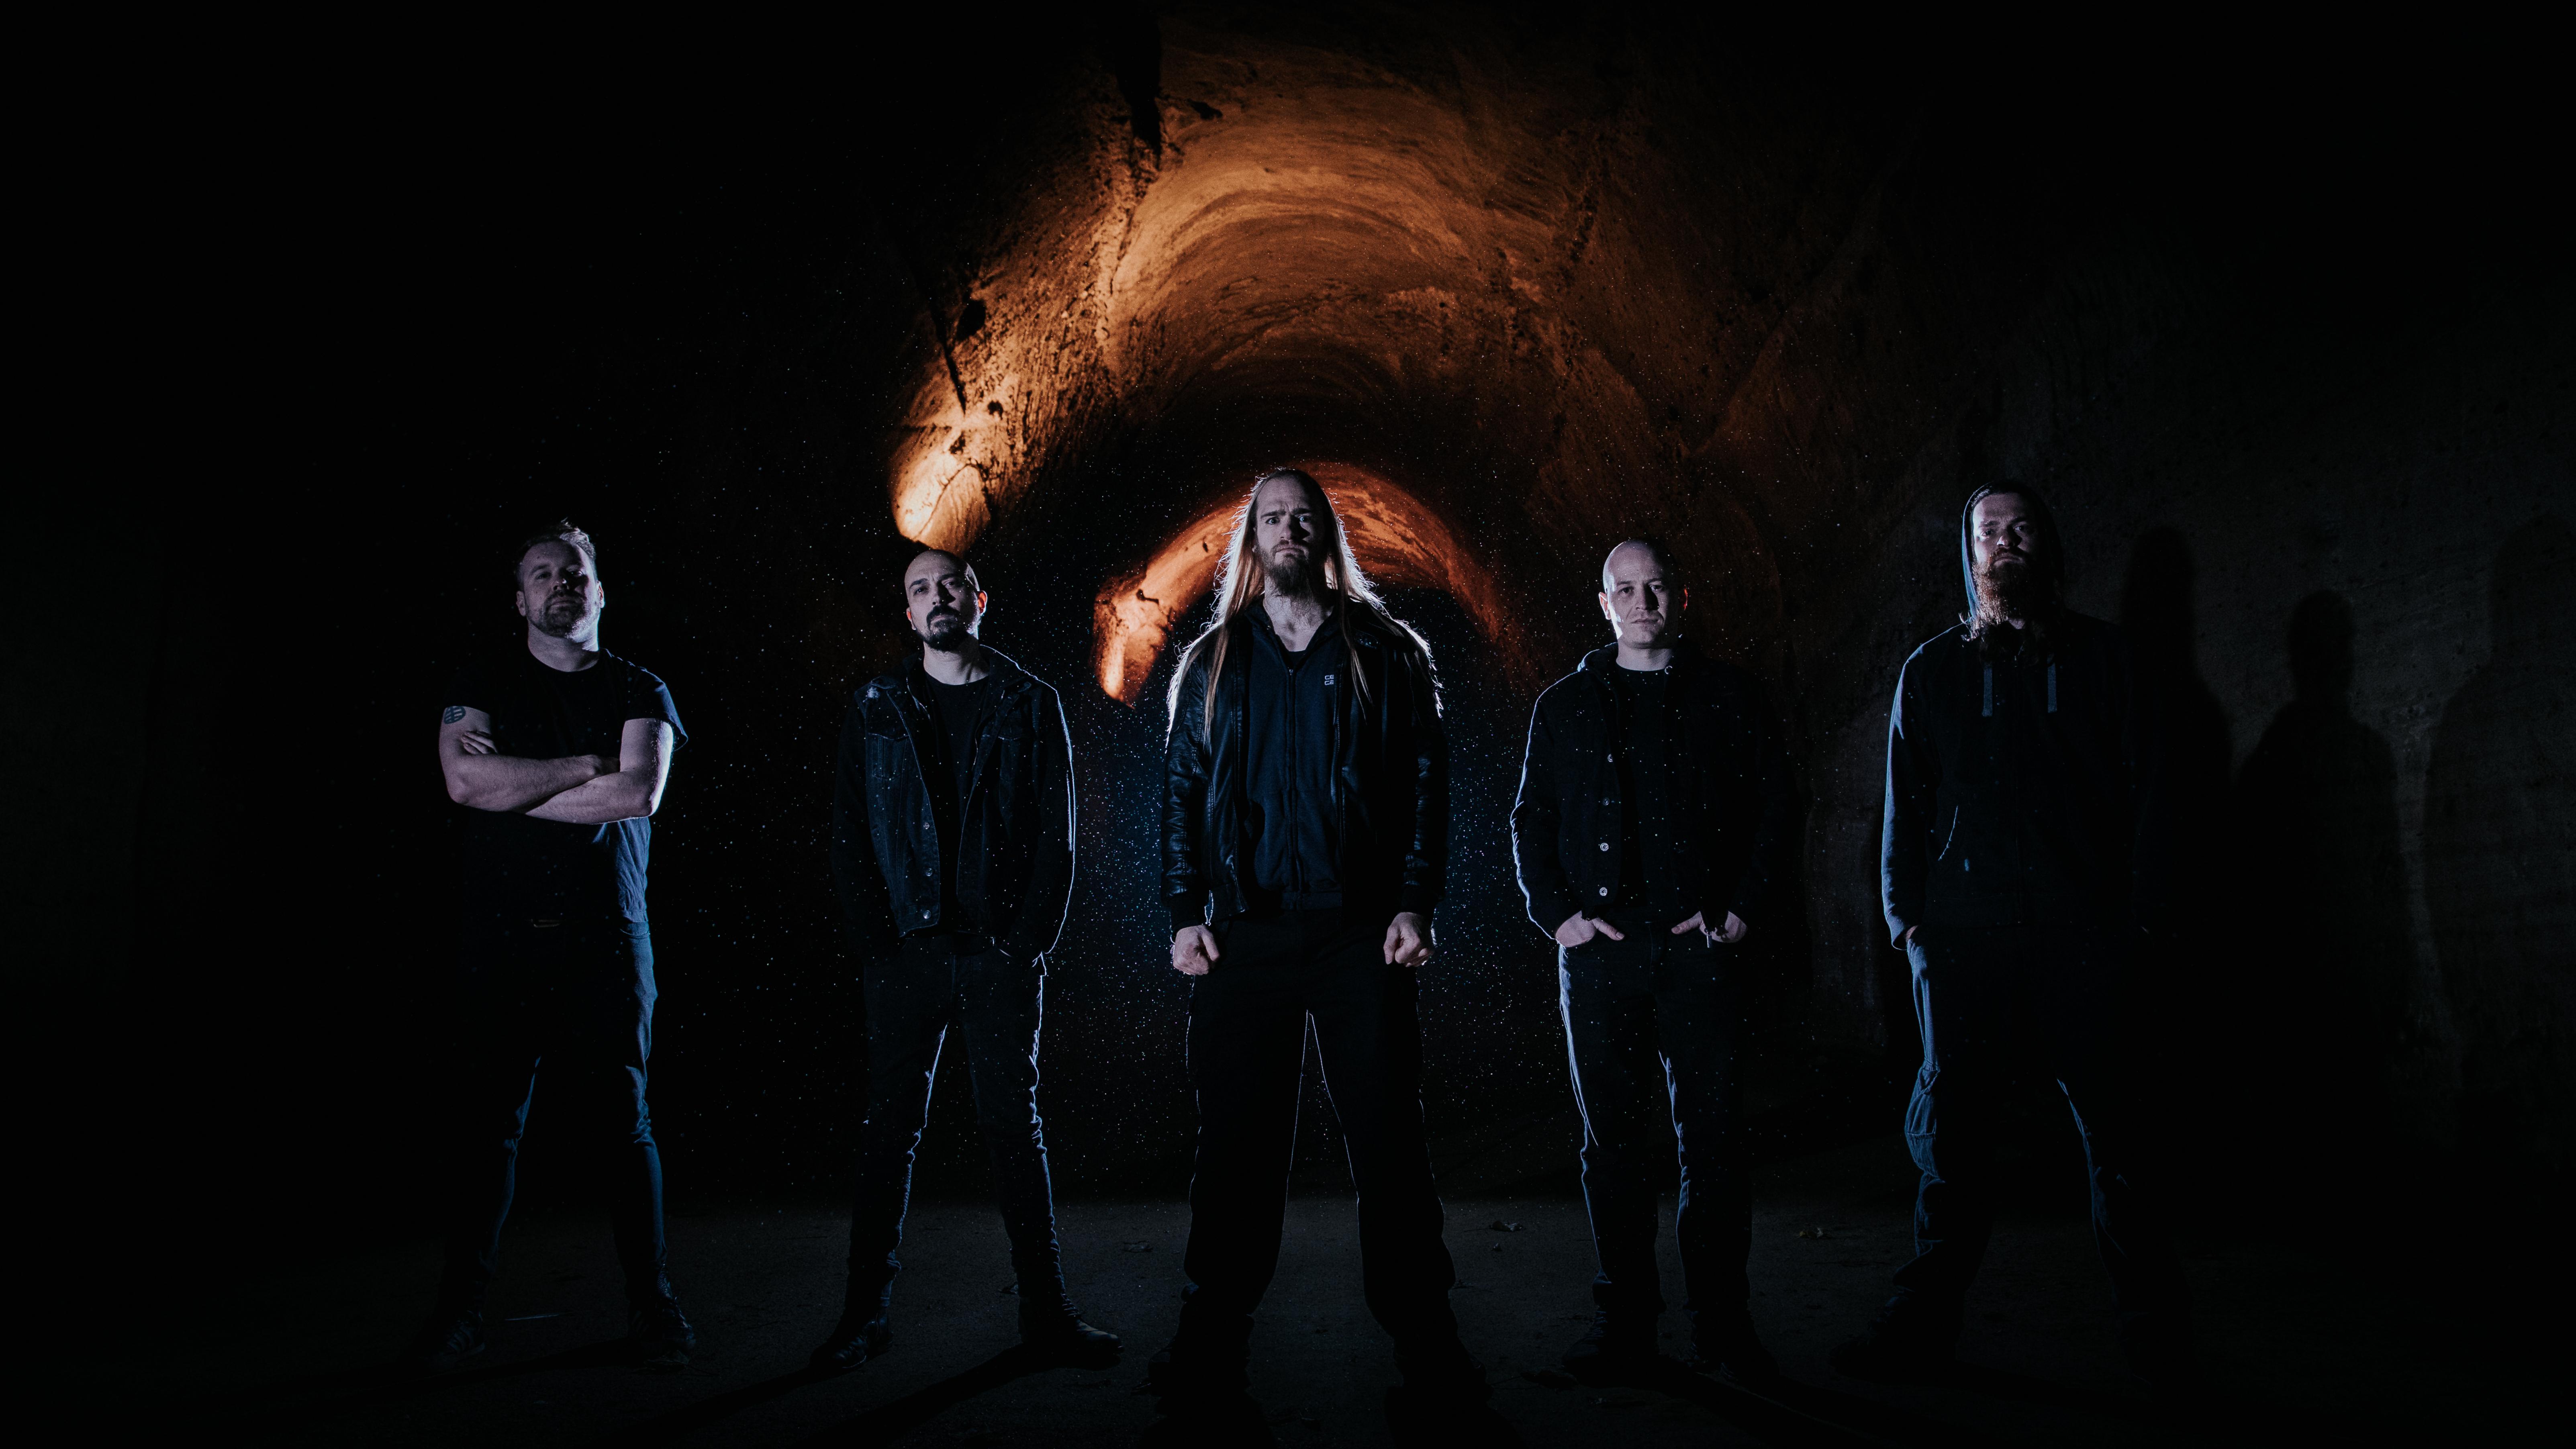 UK black metal outfit Antre have spawned a Dark Spectrum